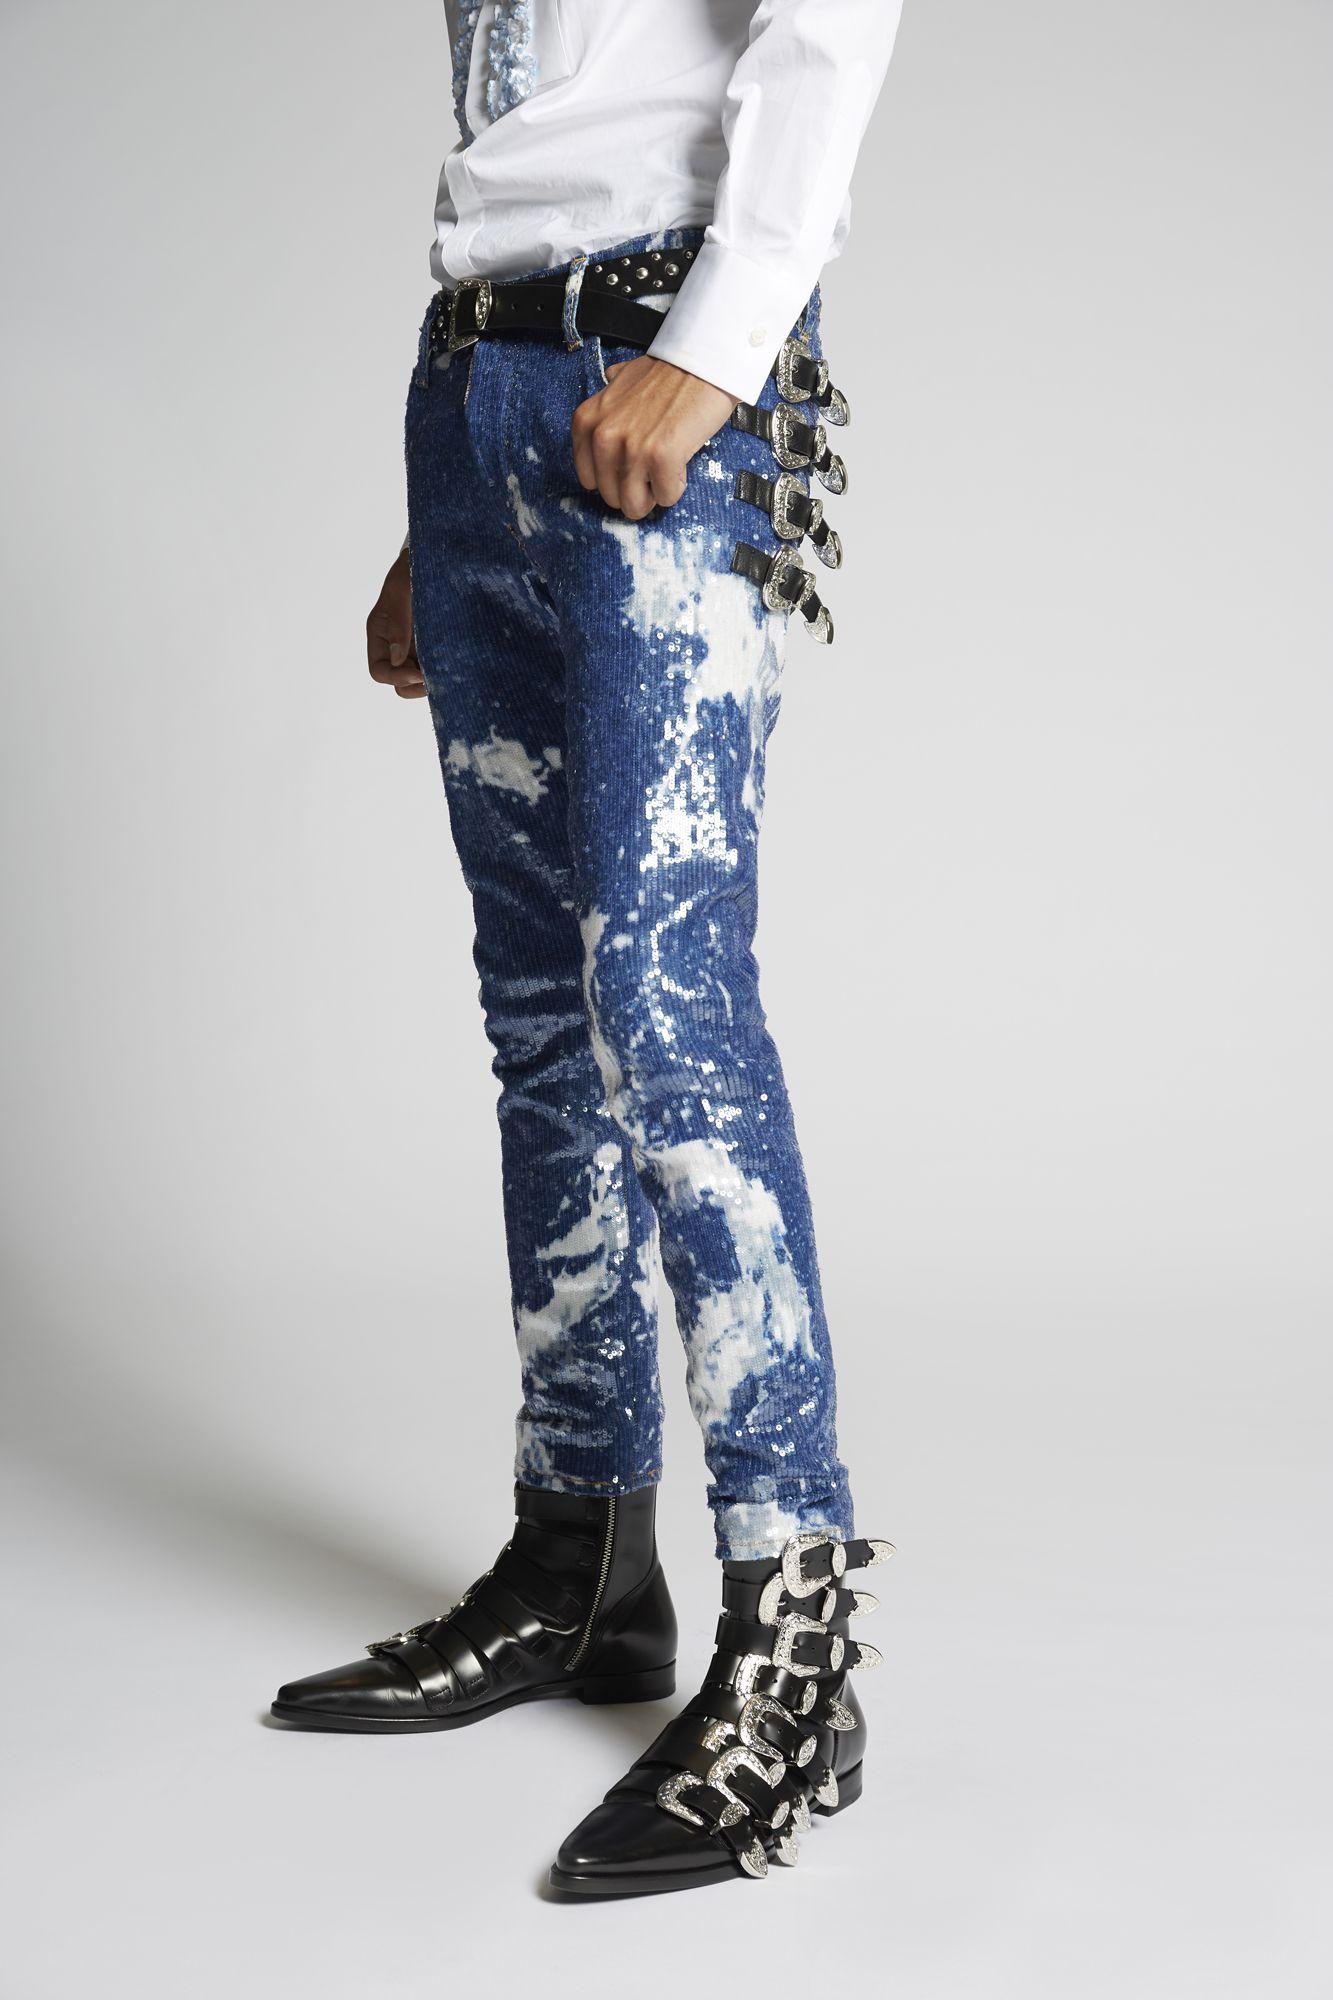 Maculato Skater Jeans ブルー